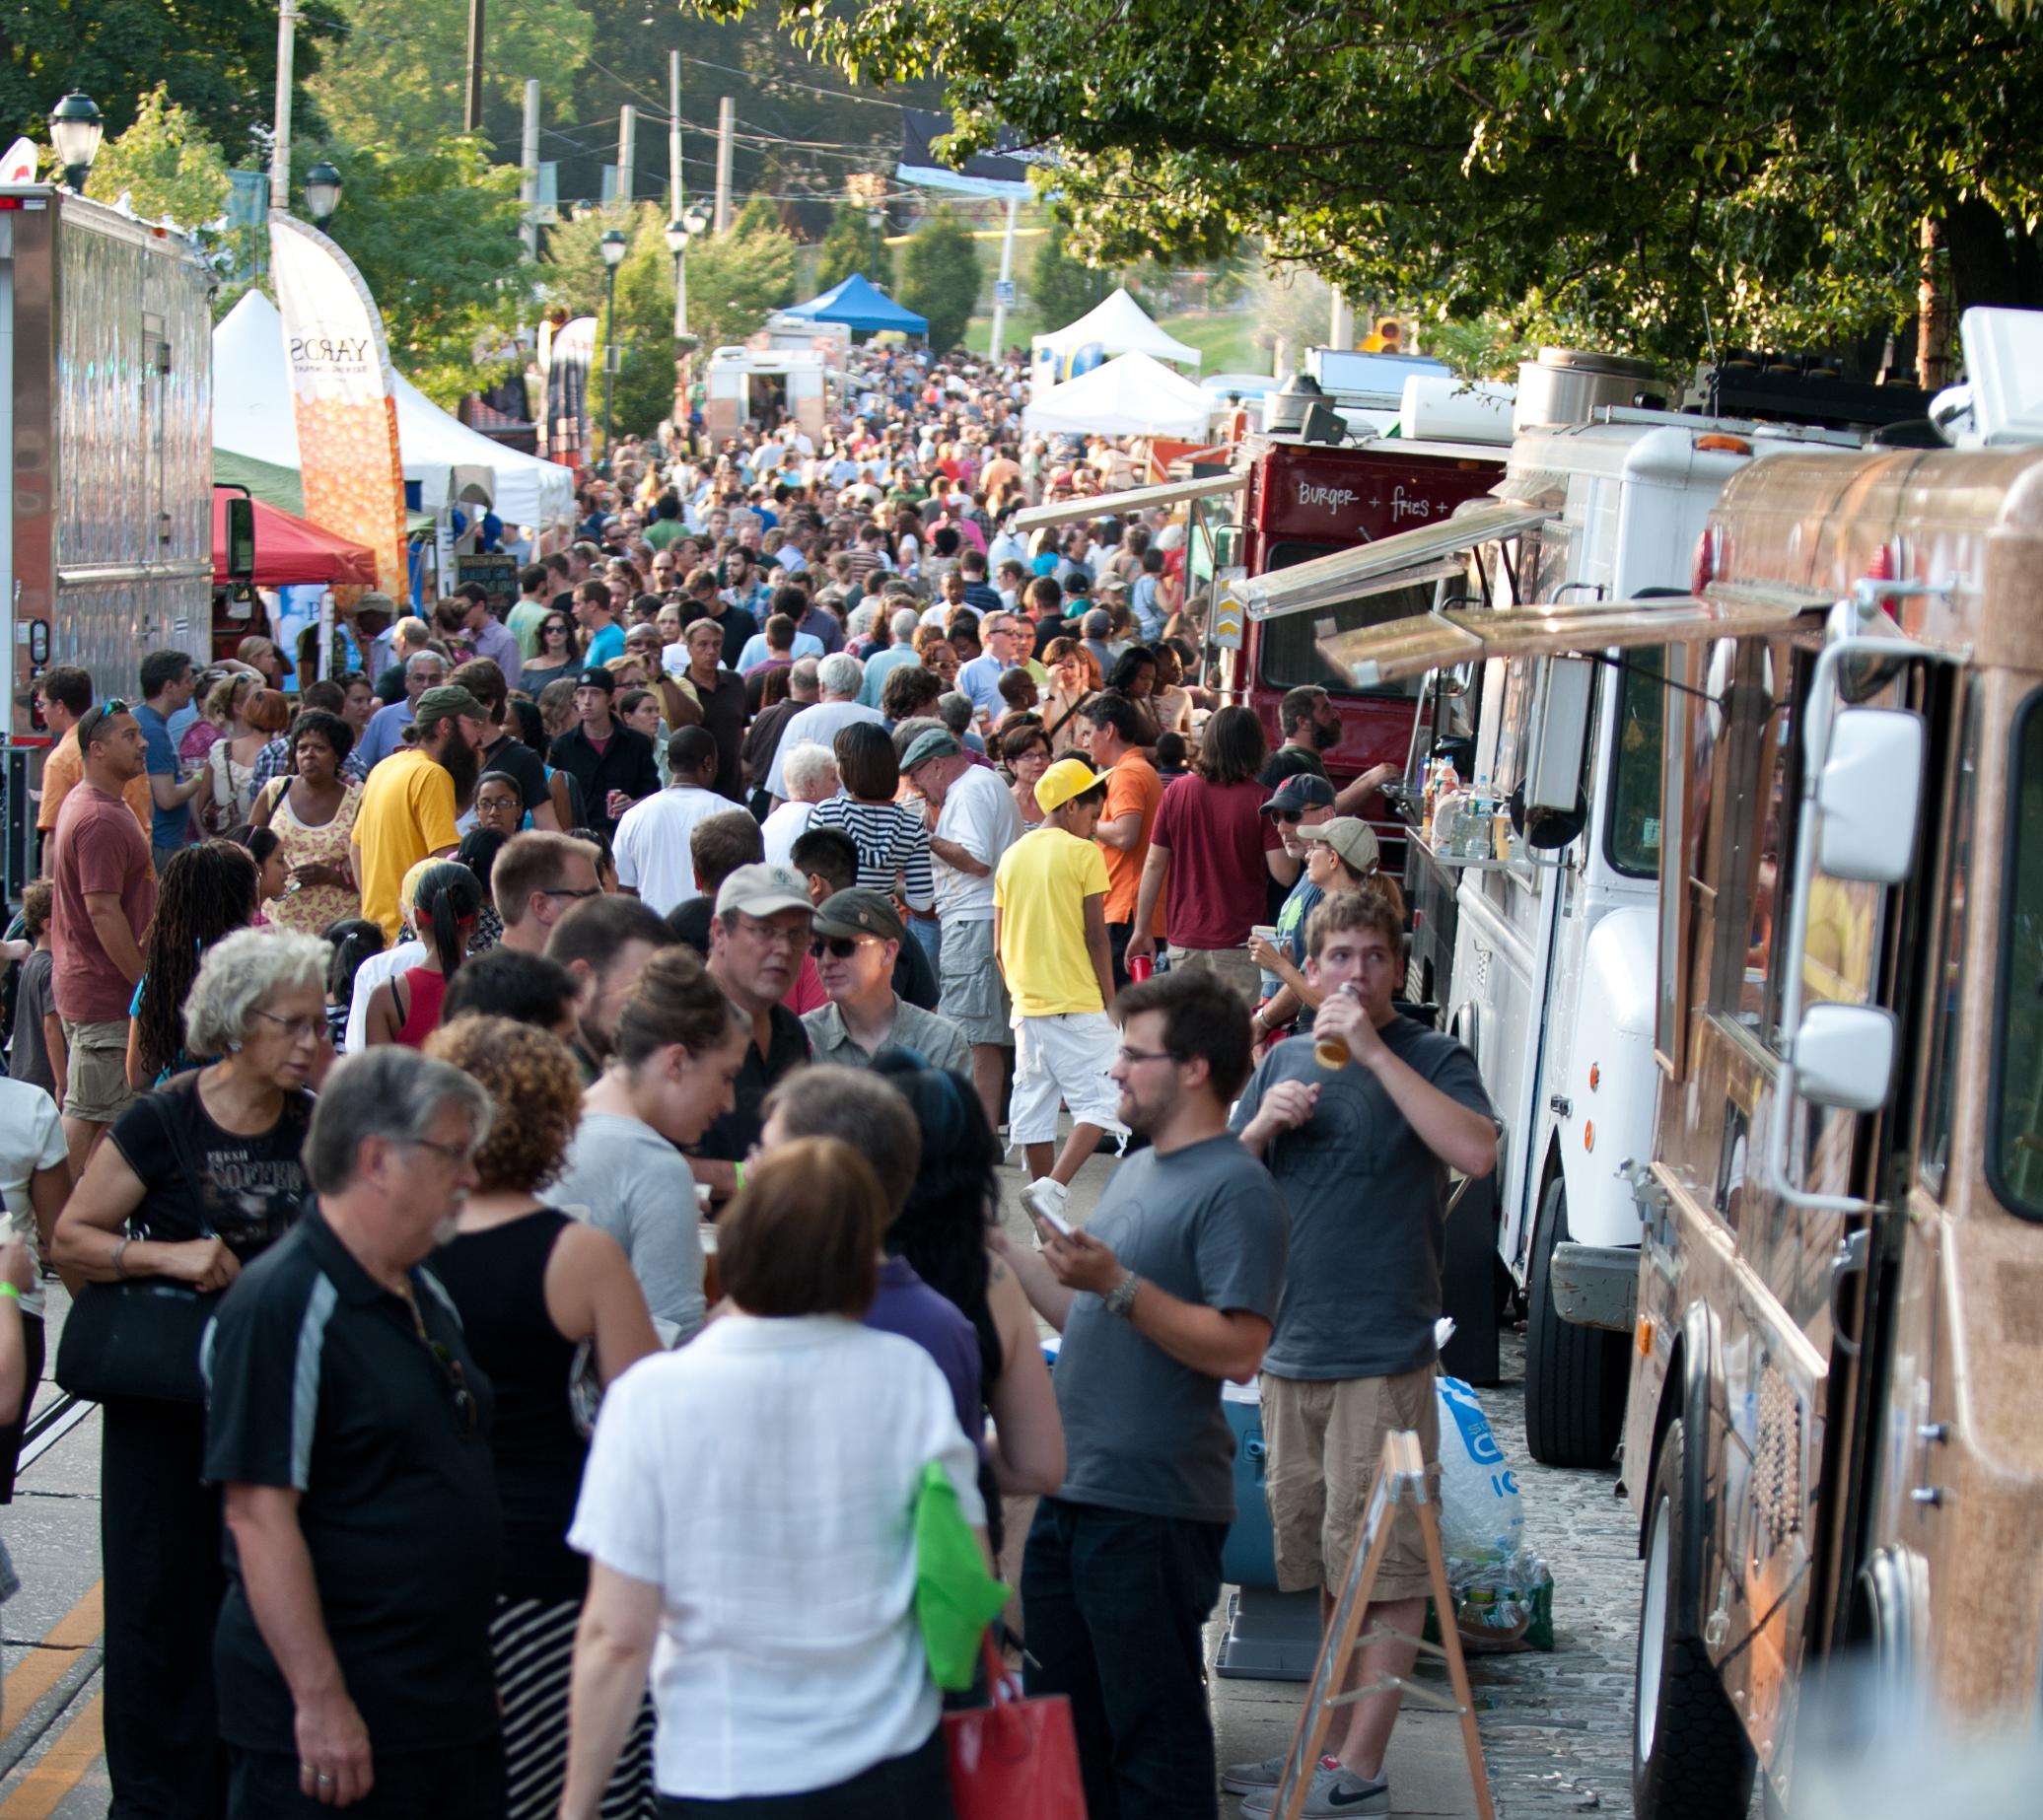 Street Fare Food Truck Festival in Mt. Airy